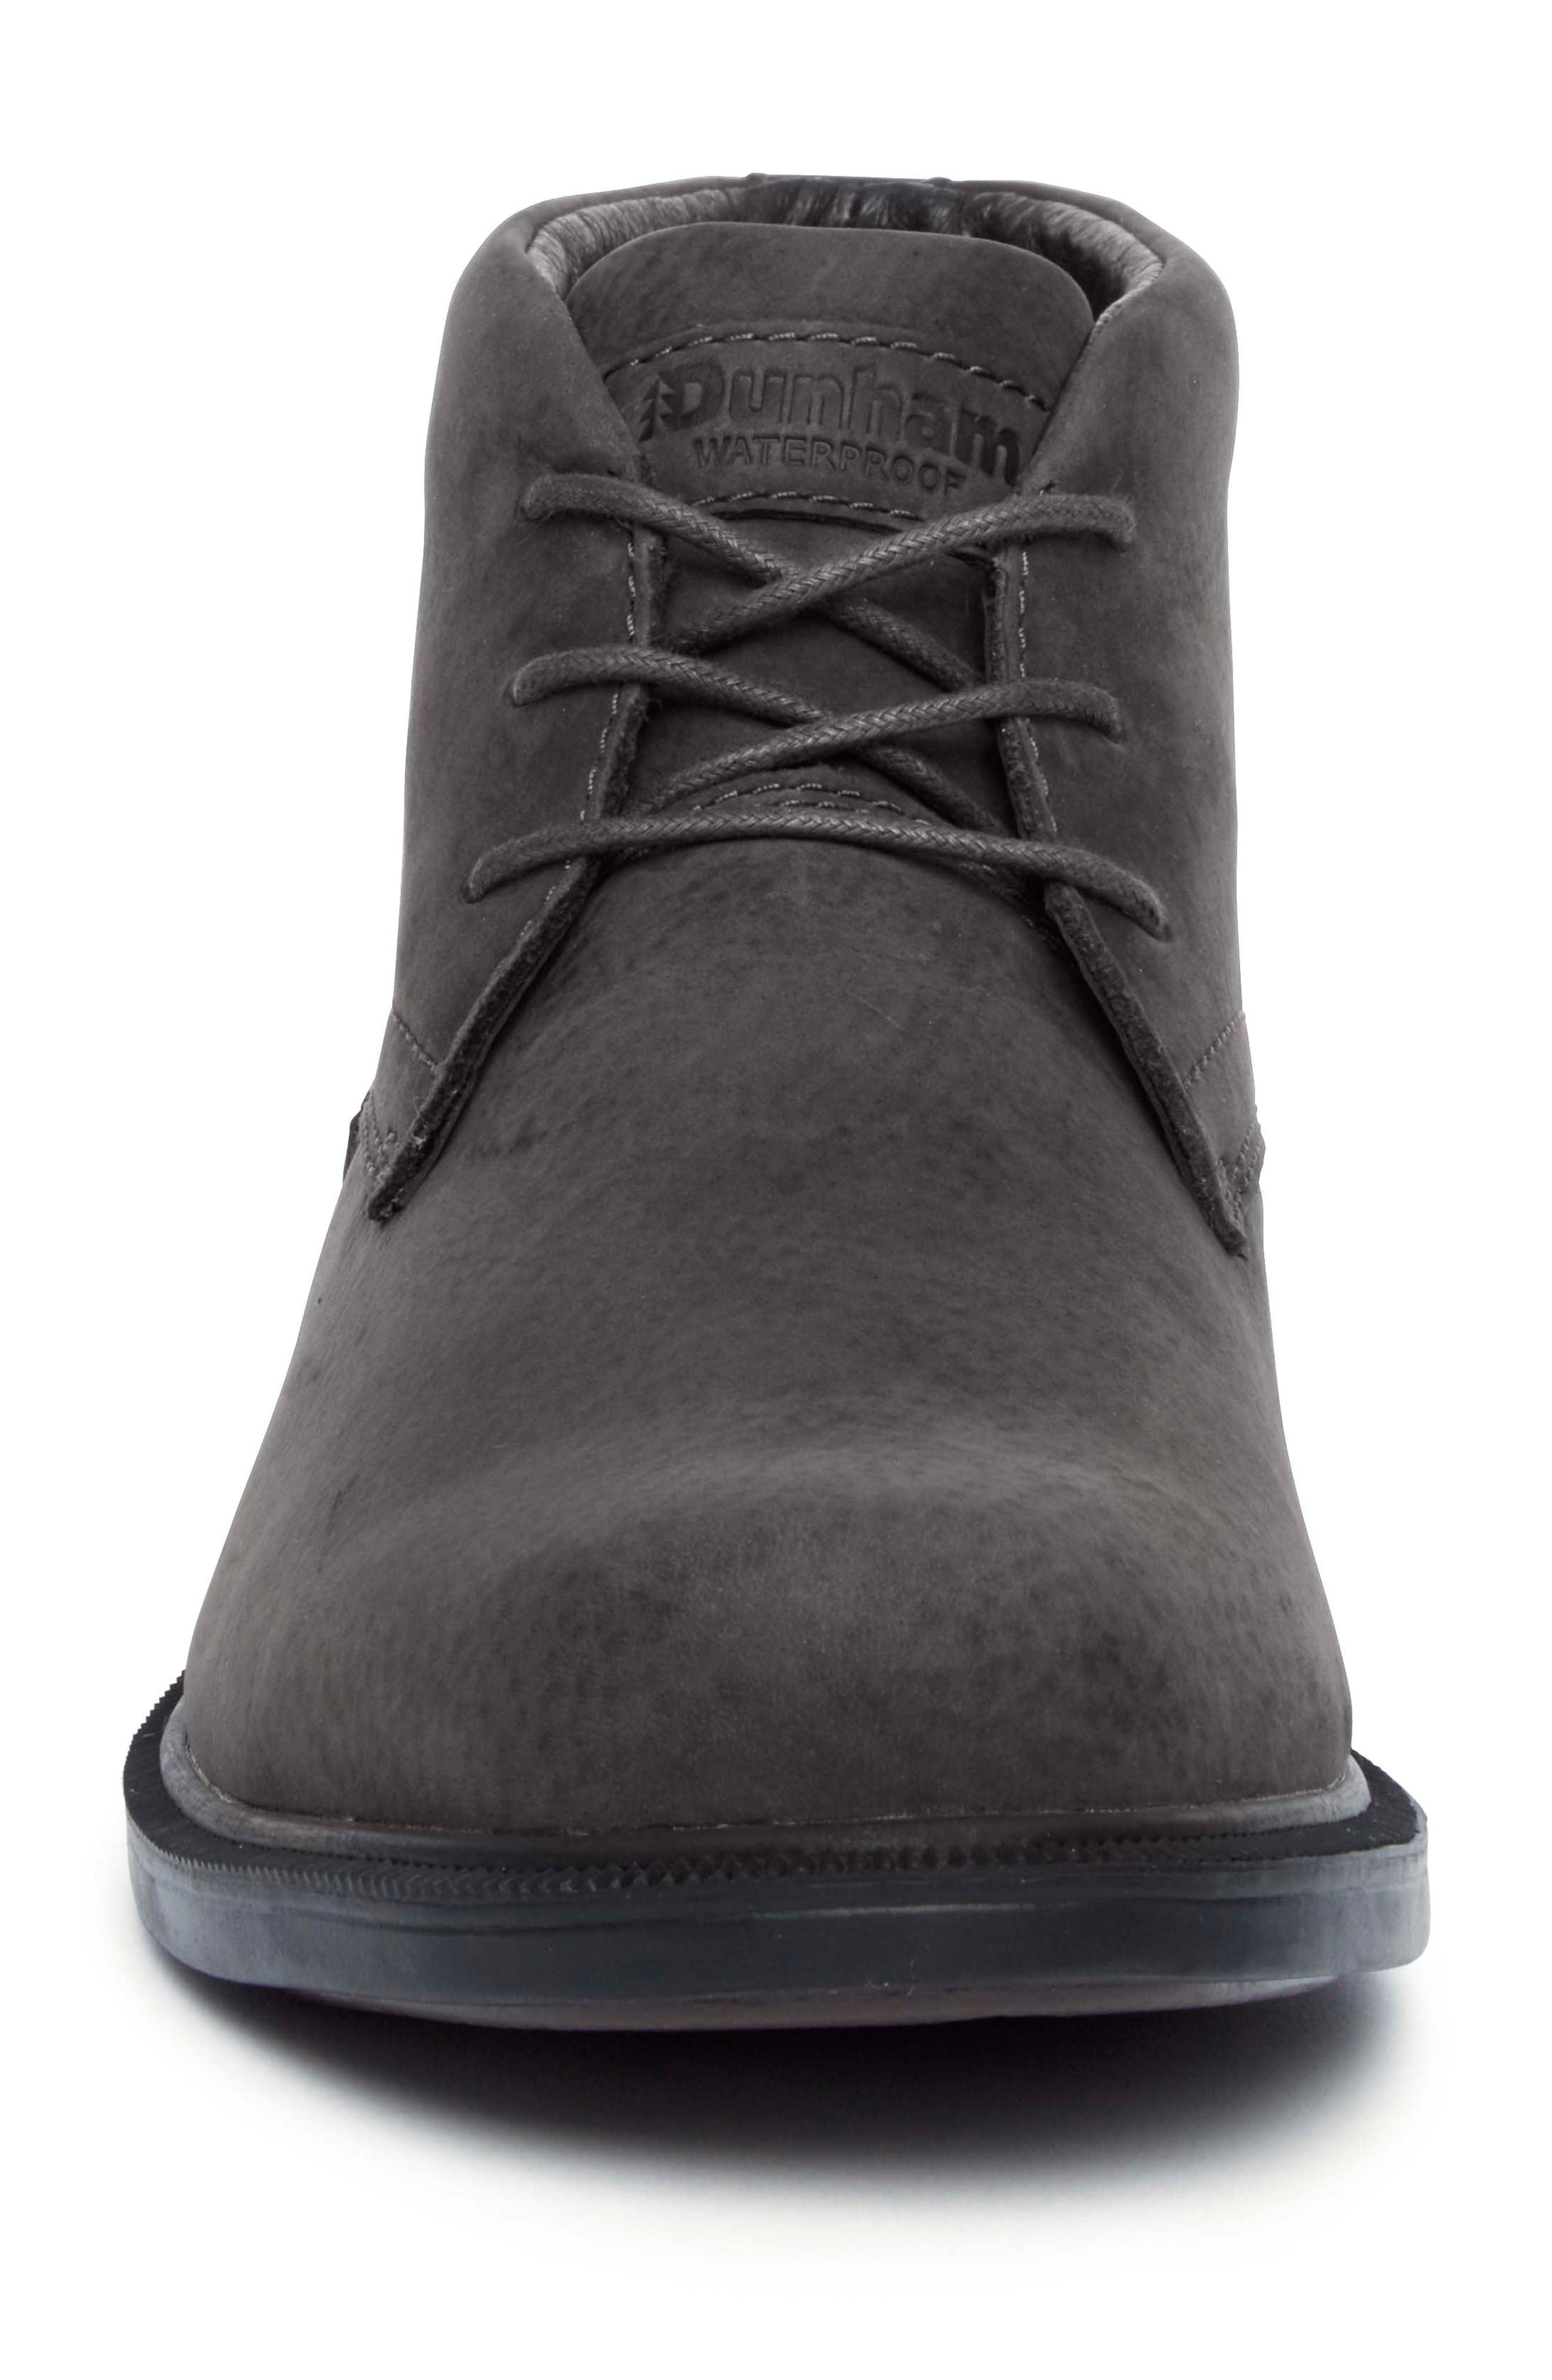 DUNHAM, Jericho Waterproof Chukka Boot, Alternate thumbnail 4, color, 020